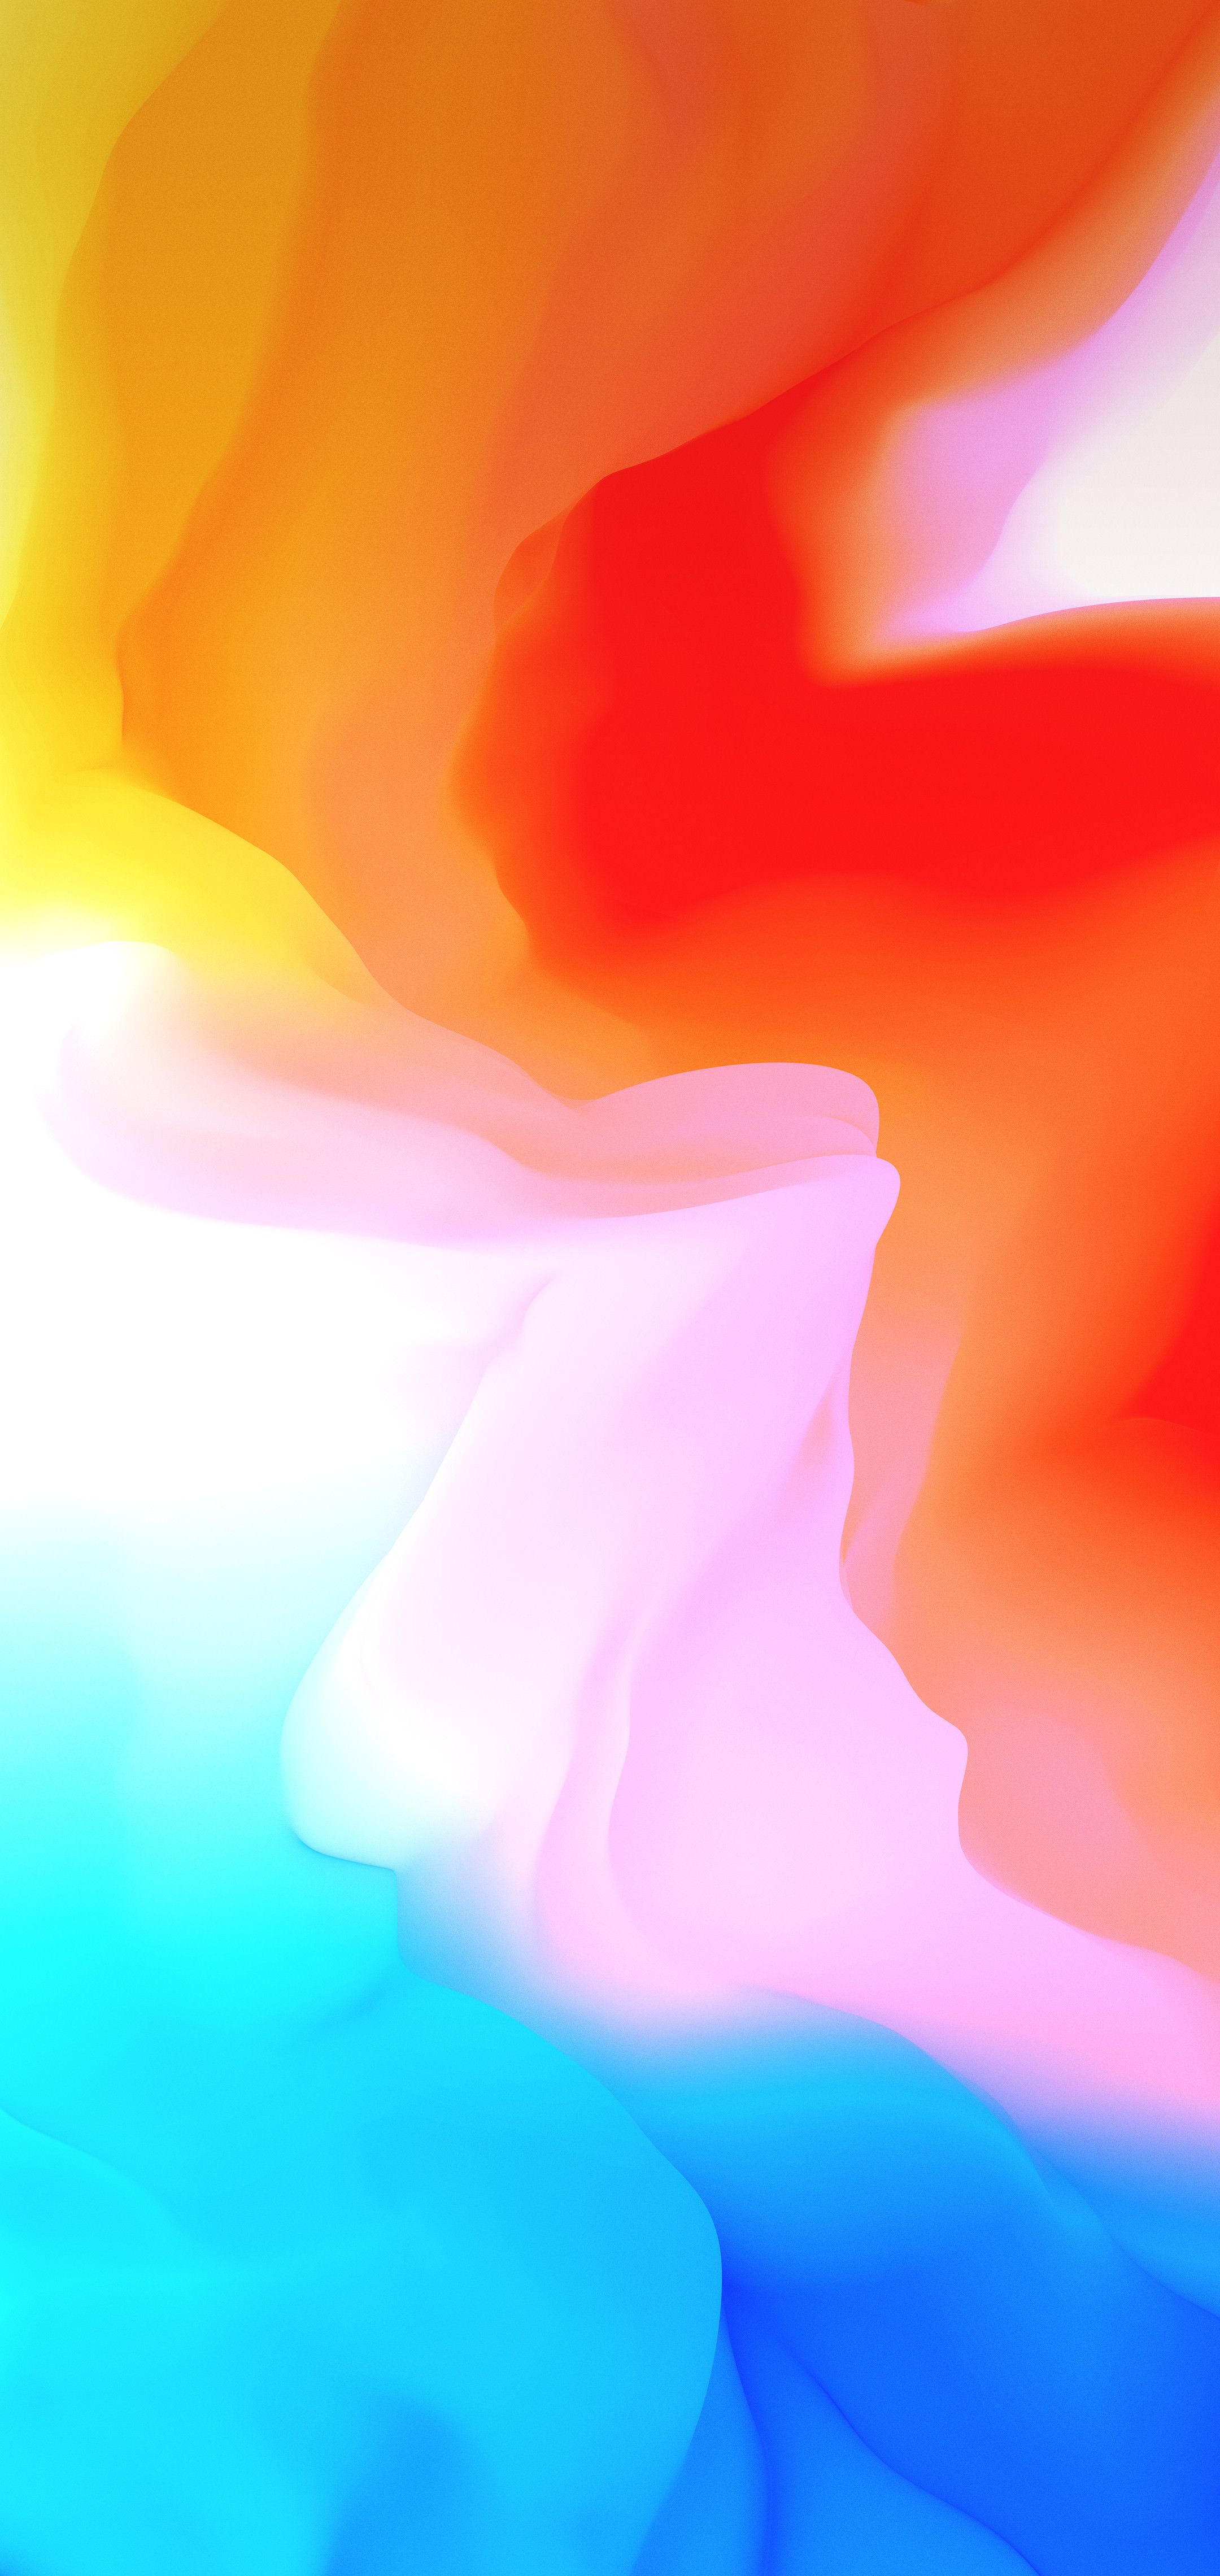 OnePlus 6 Wallpapers Beautiful Wallpaper Pinterest Orange 2160x4560